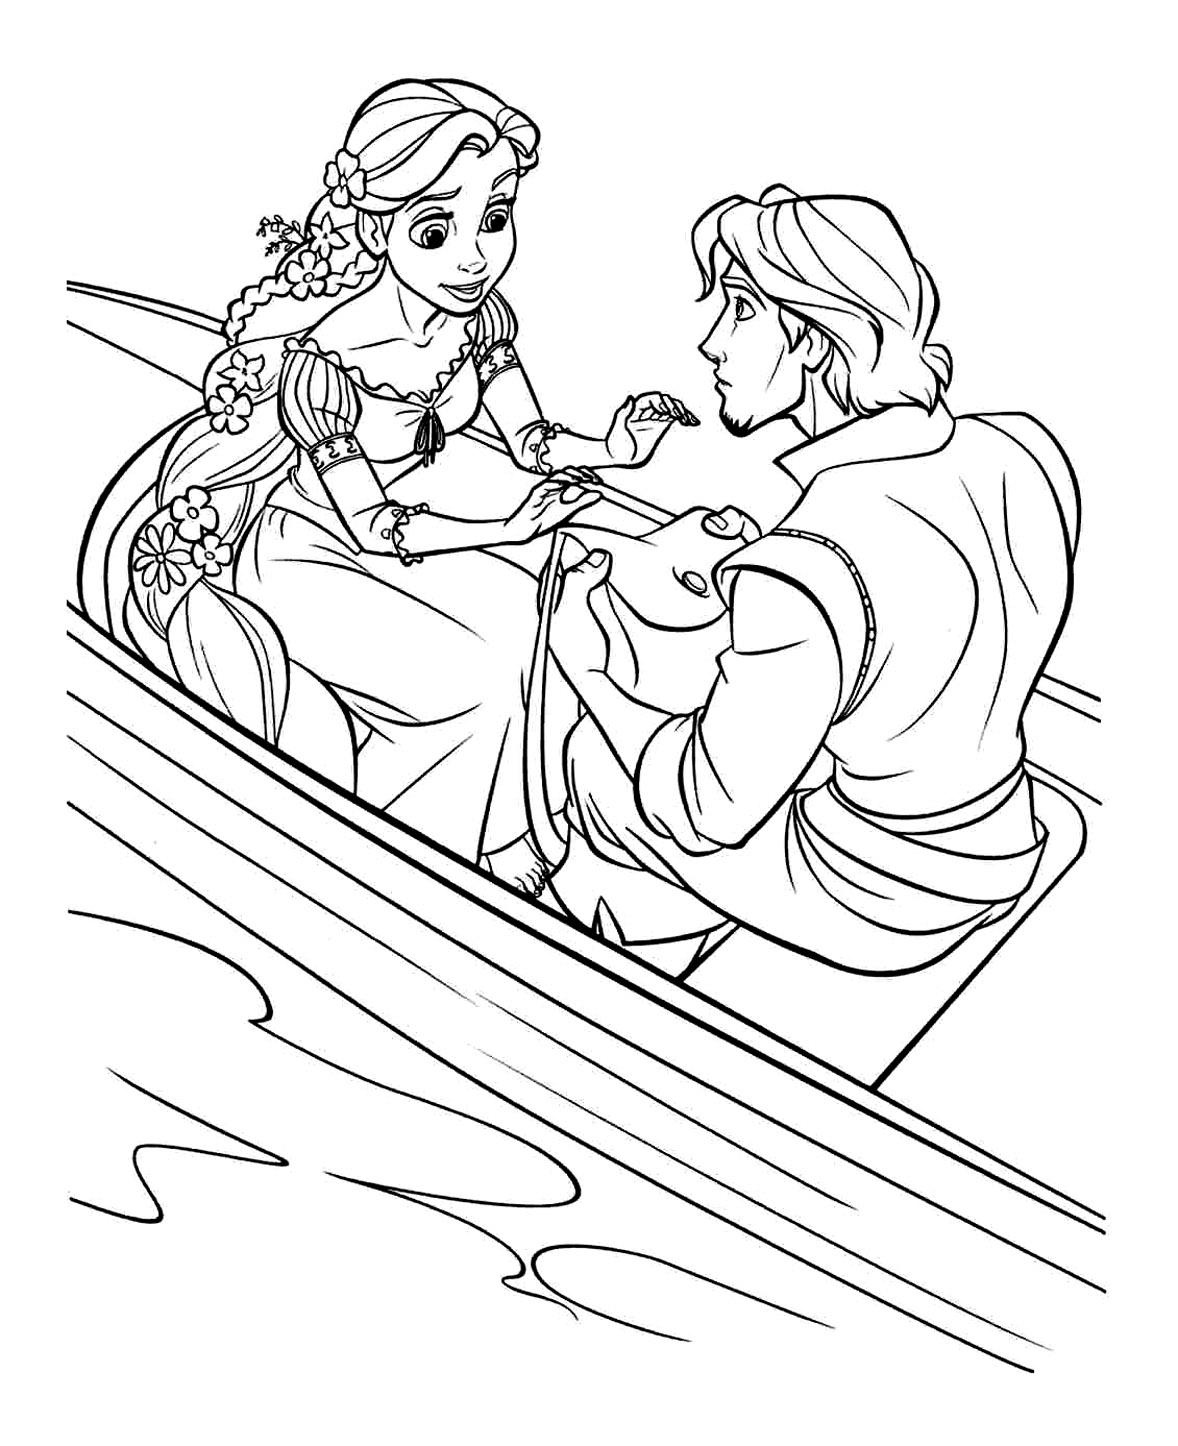 Raiponce flynn bateau coloriage raiponce coloriages - Dessin raiponce ...